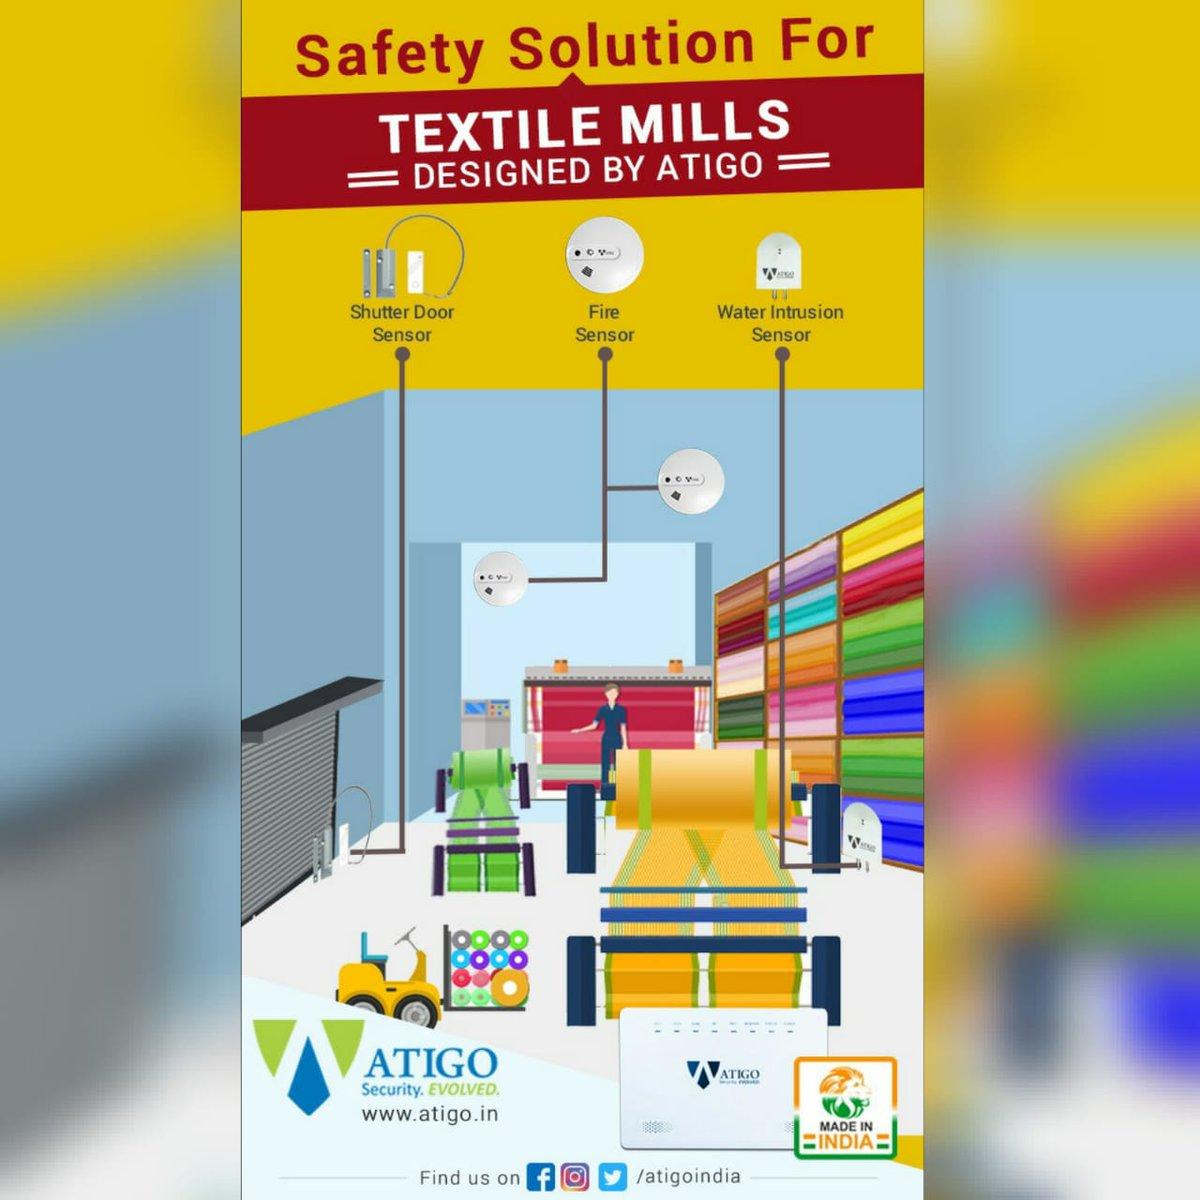 Safety solution for textile mills - designed by Atigo  http://www.atigo.in #atigoindia #textilemills #SafetyFirstpic.twitter.com/SRqHkIuj0X